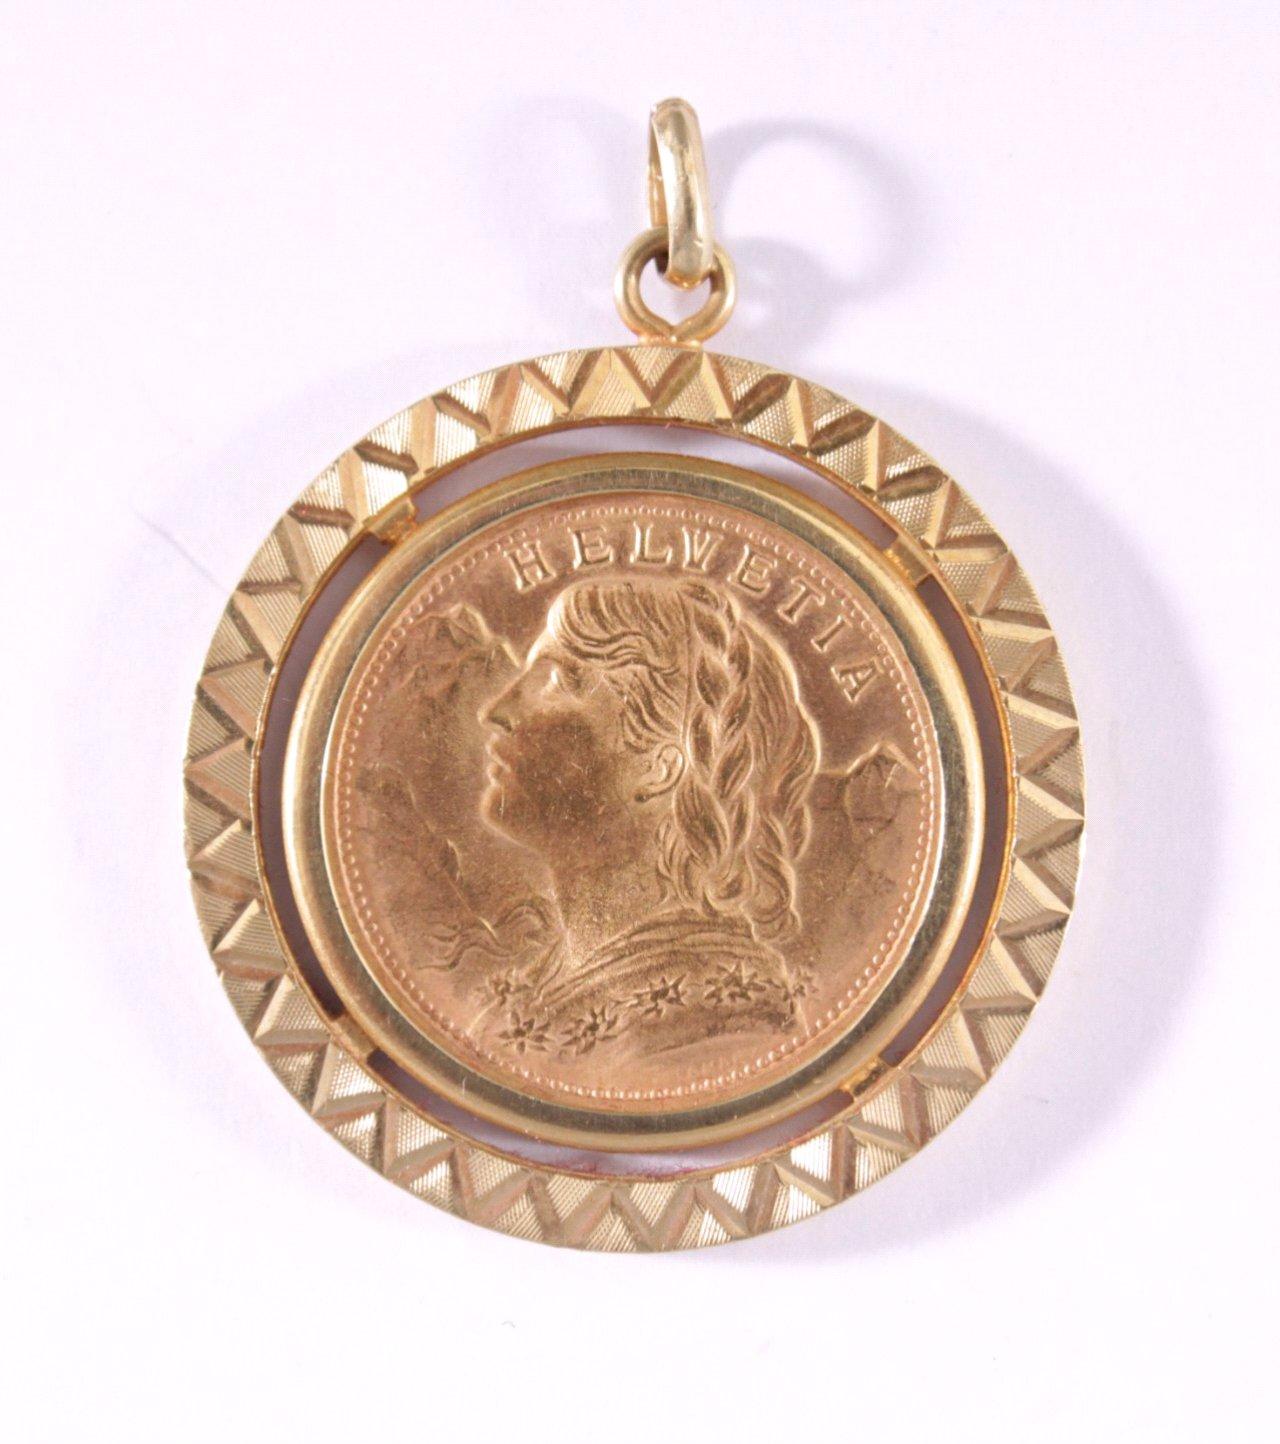 Anhänger mit Münze, Vreneli 20 Franken Gold v. 1947 B